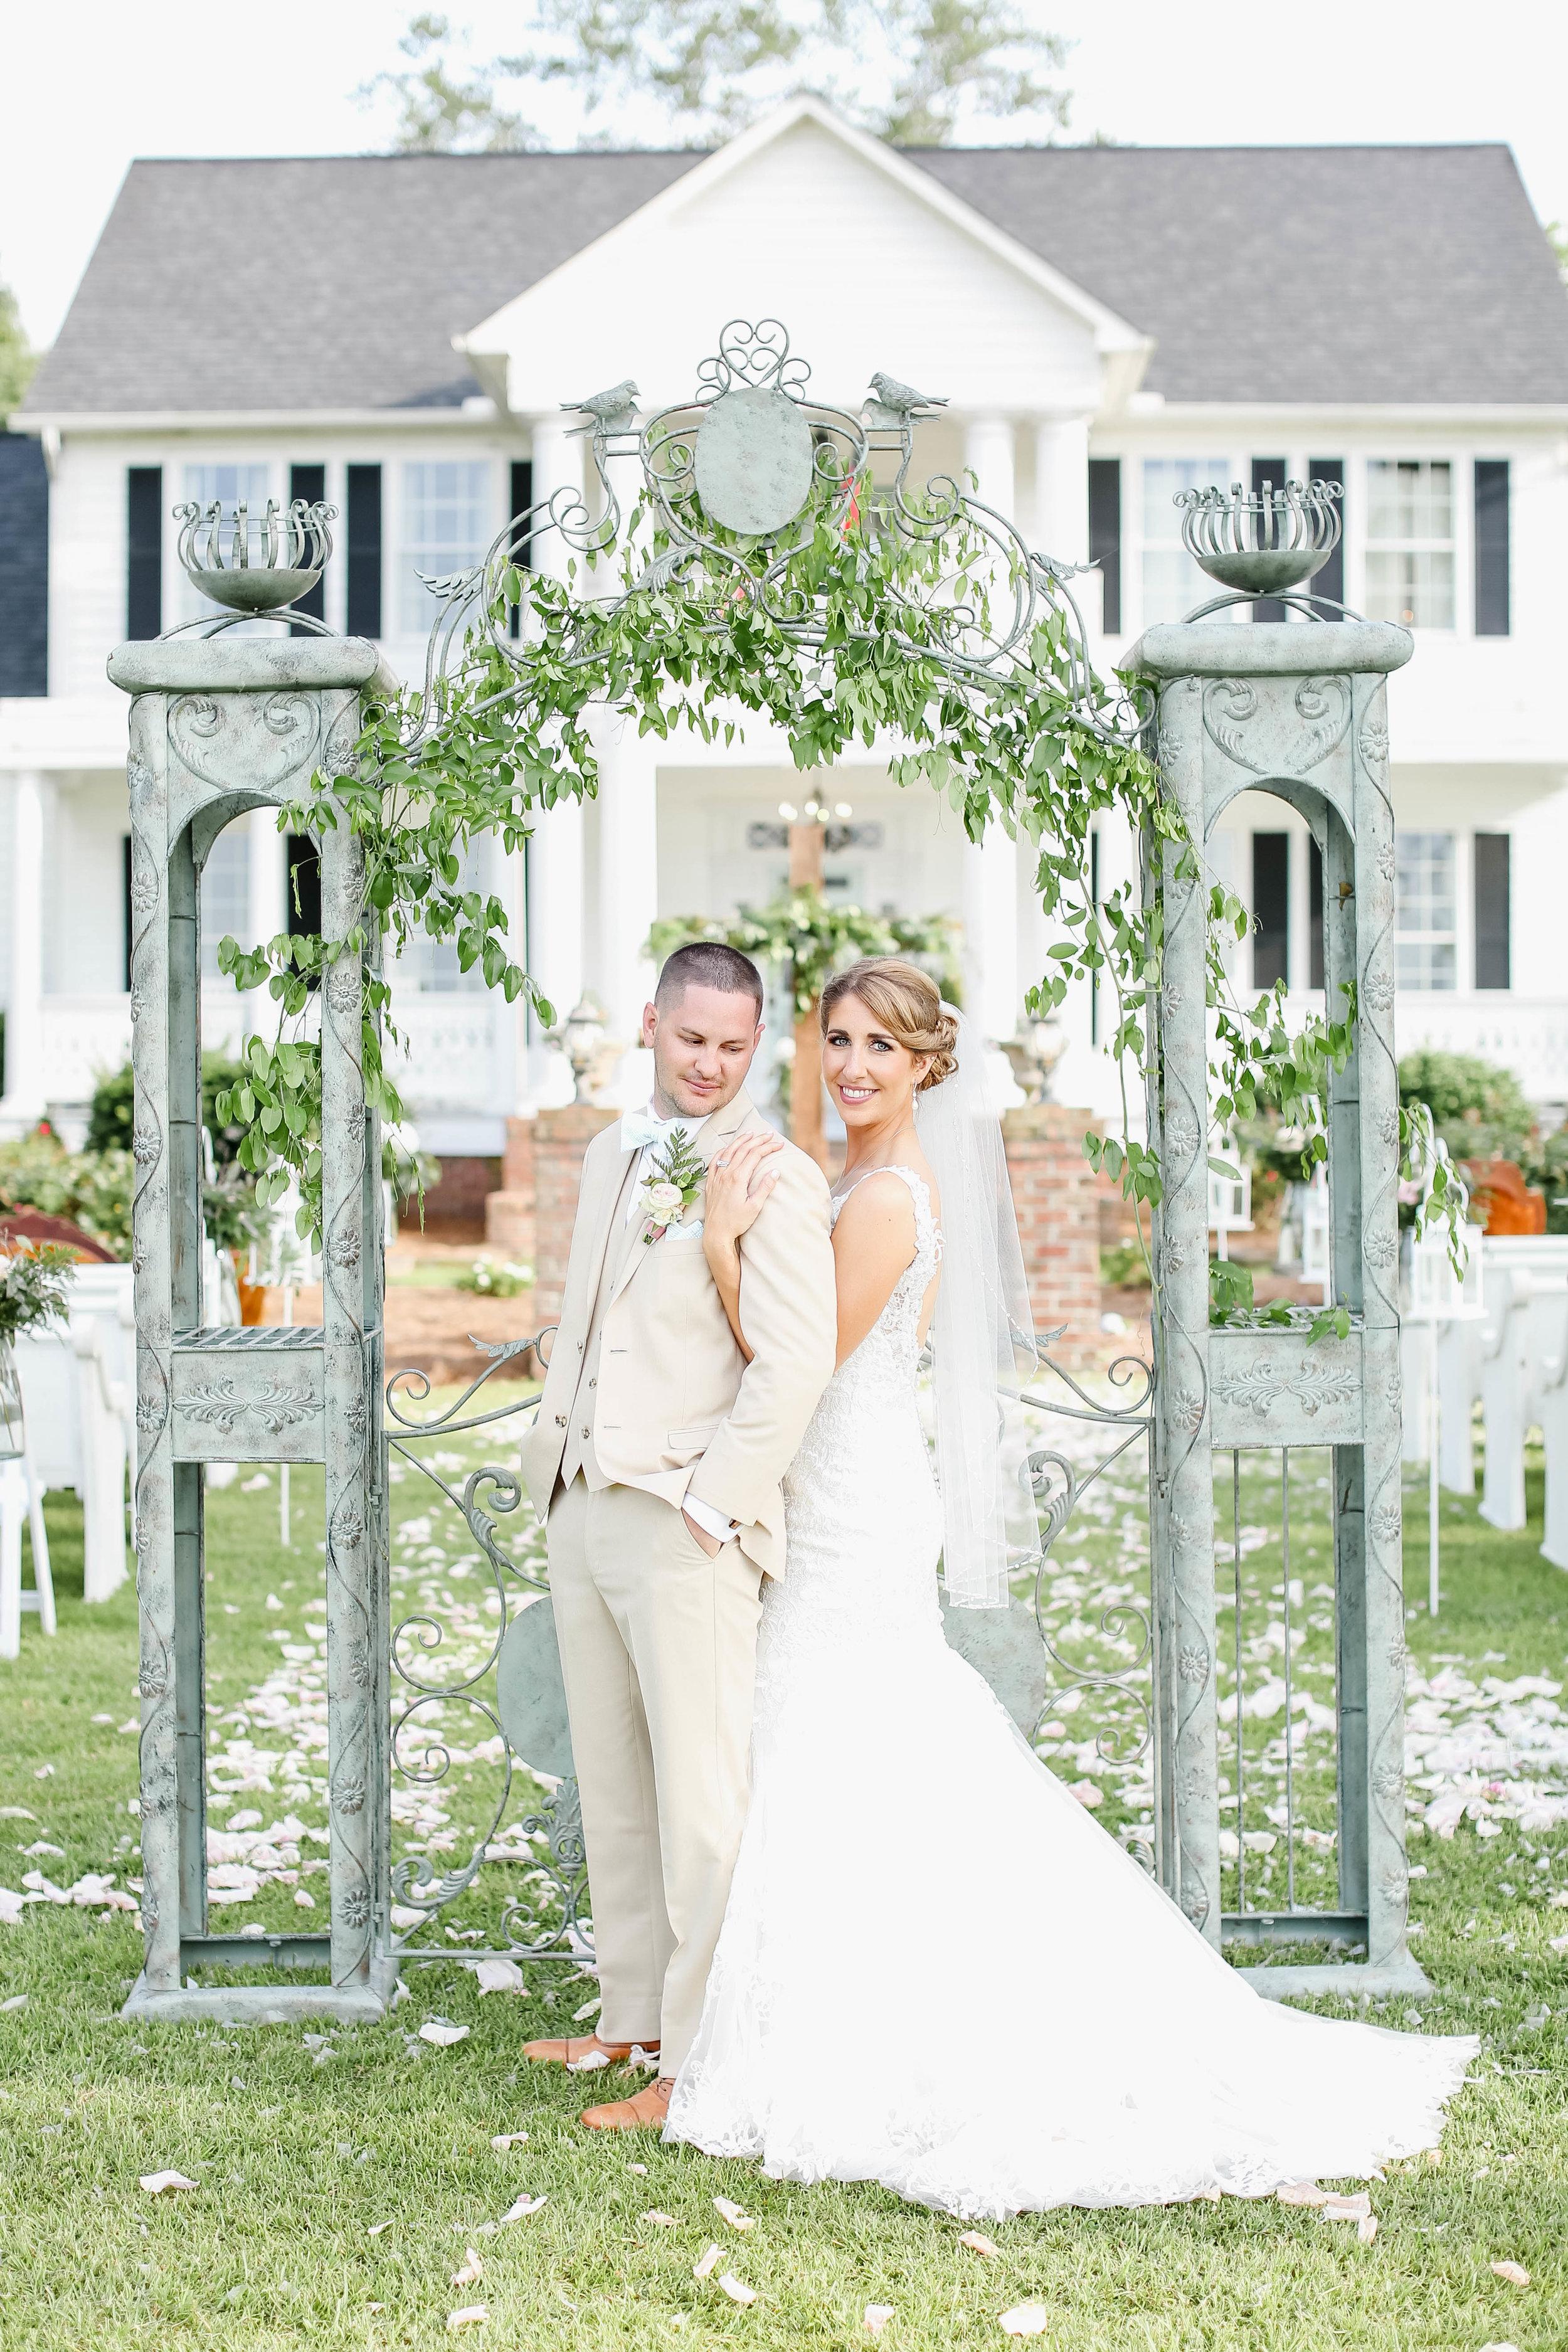 jaclyn_gregory_wedding-298.jpg